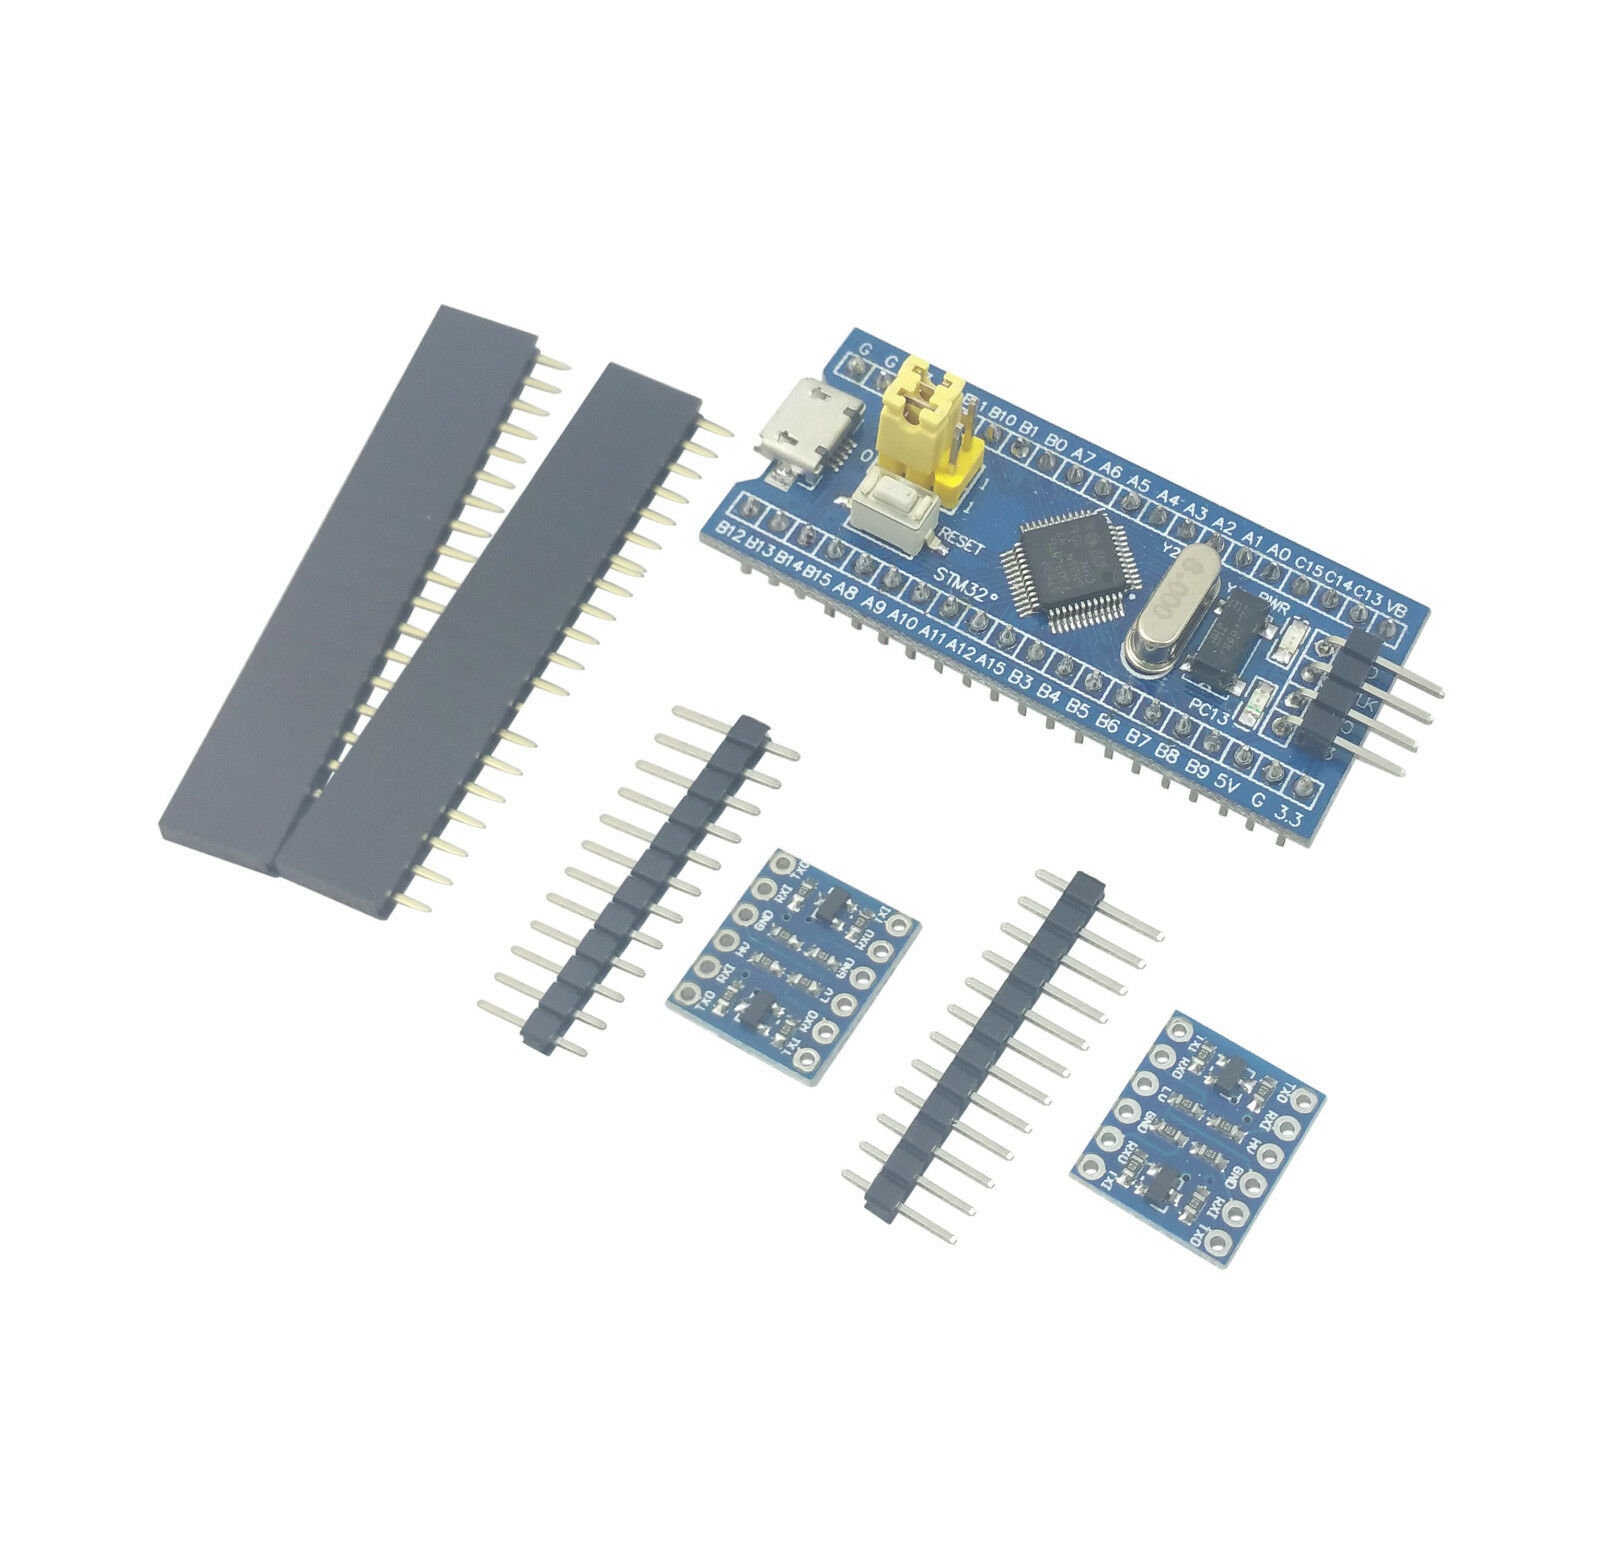 Stm32f103 Arm Stm32 Board Module Blue Pill W/ 2logic Level Converters  Headers